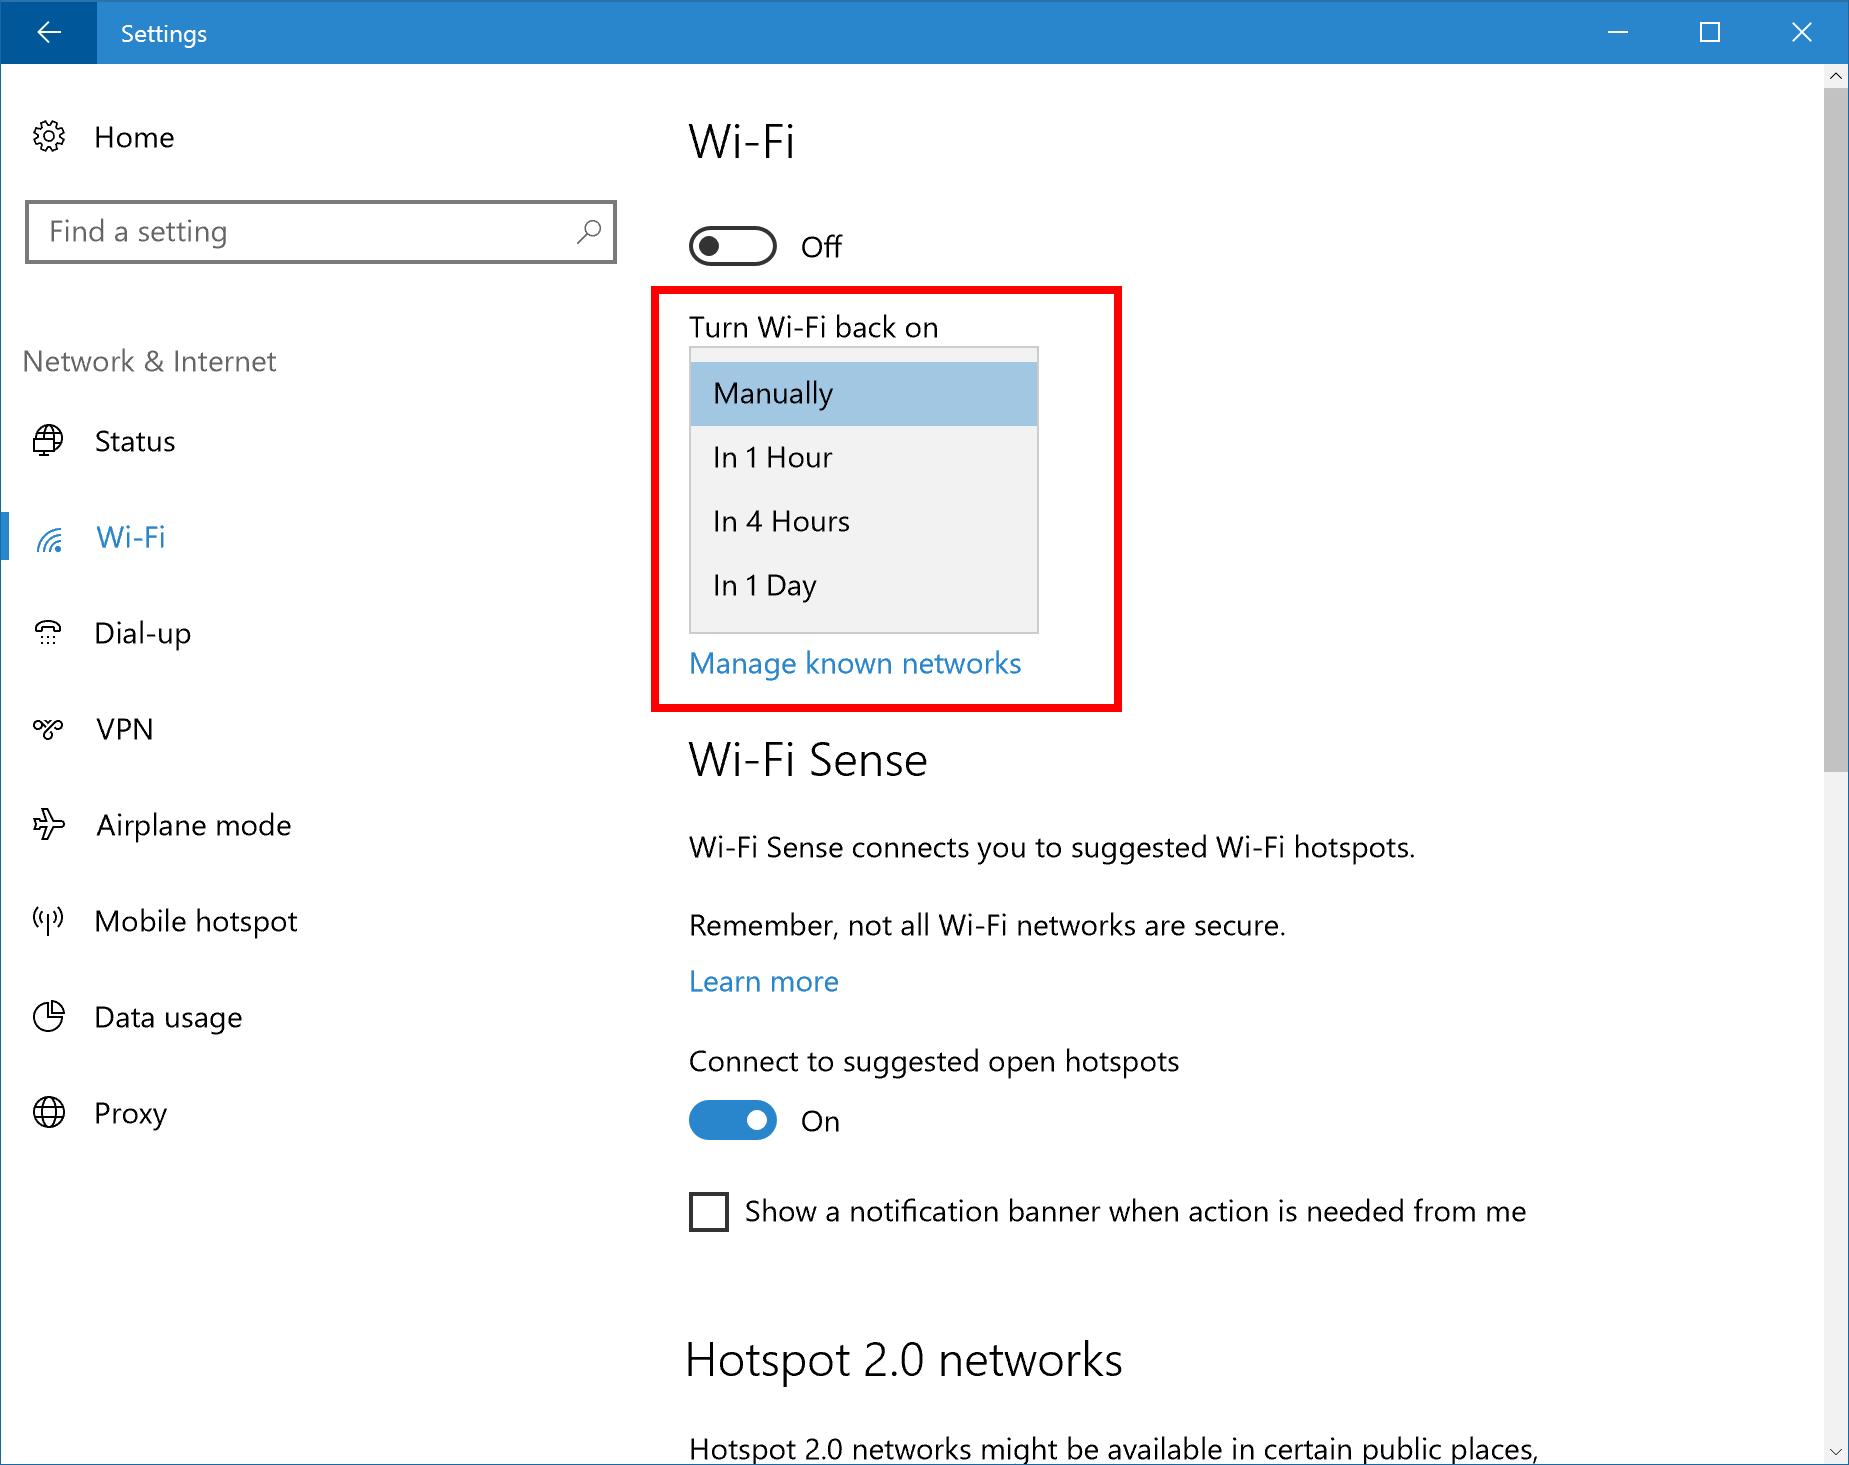 wi-fi-turn-back-on